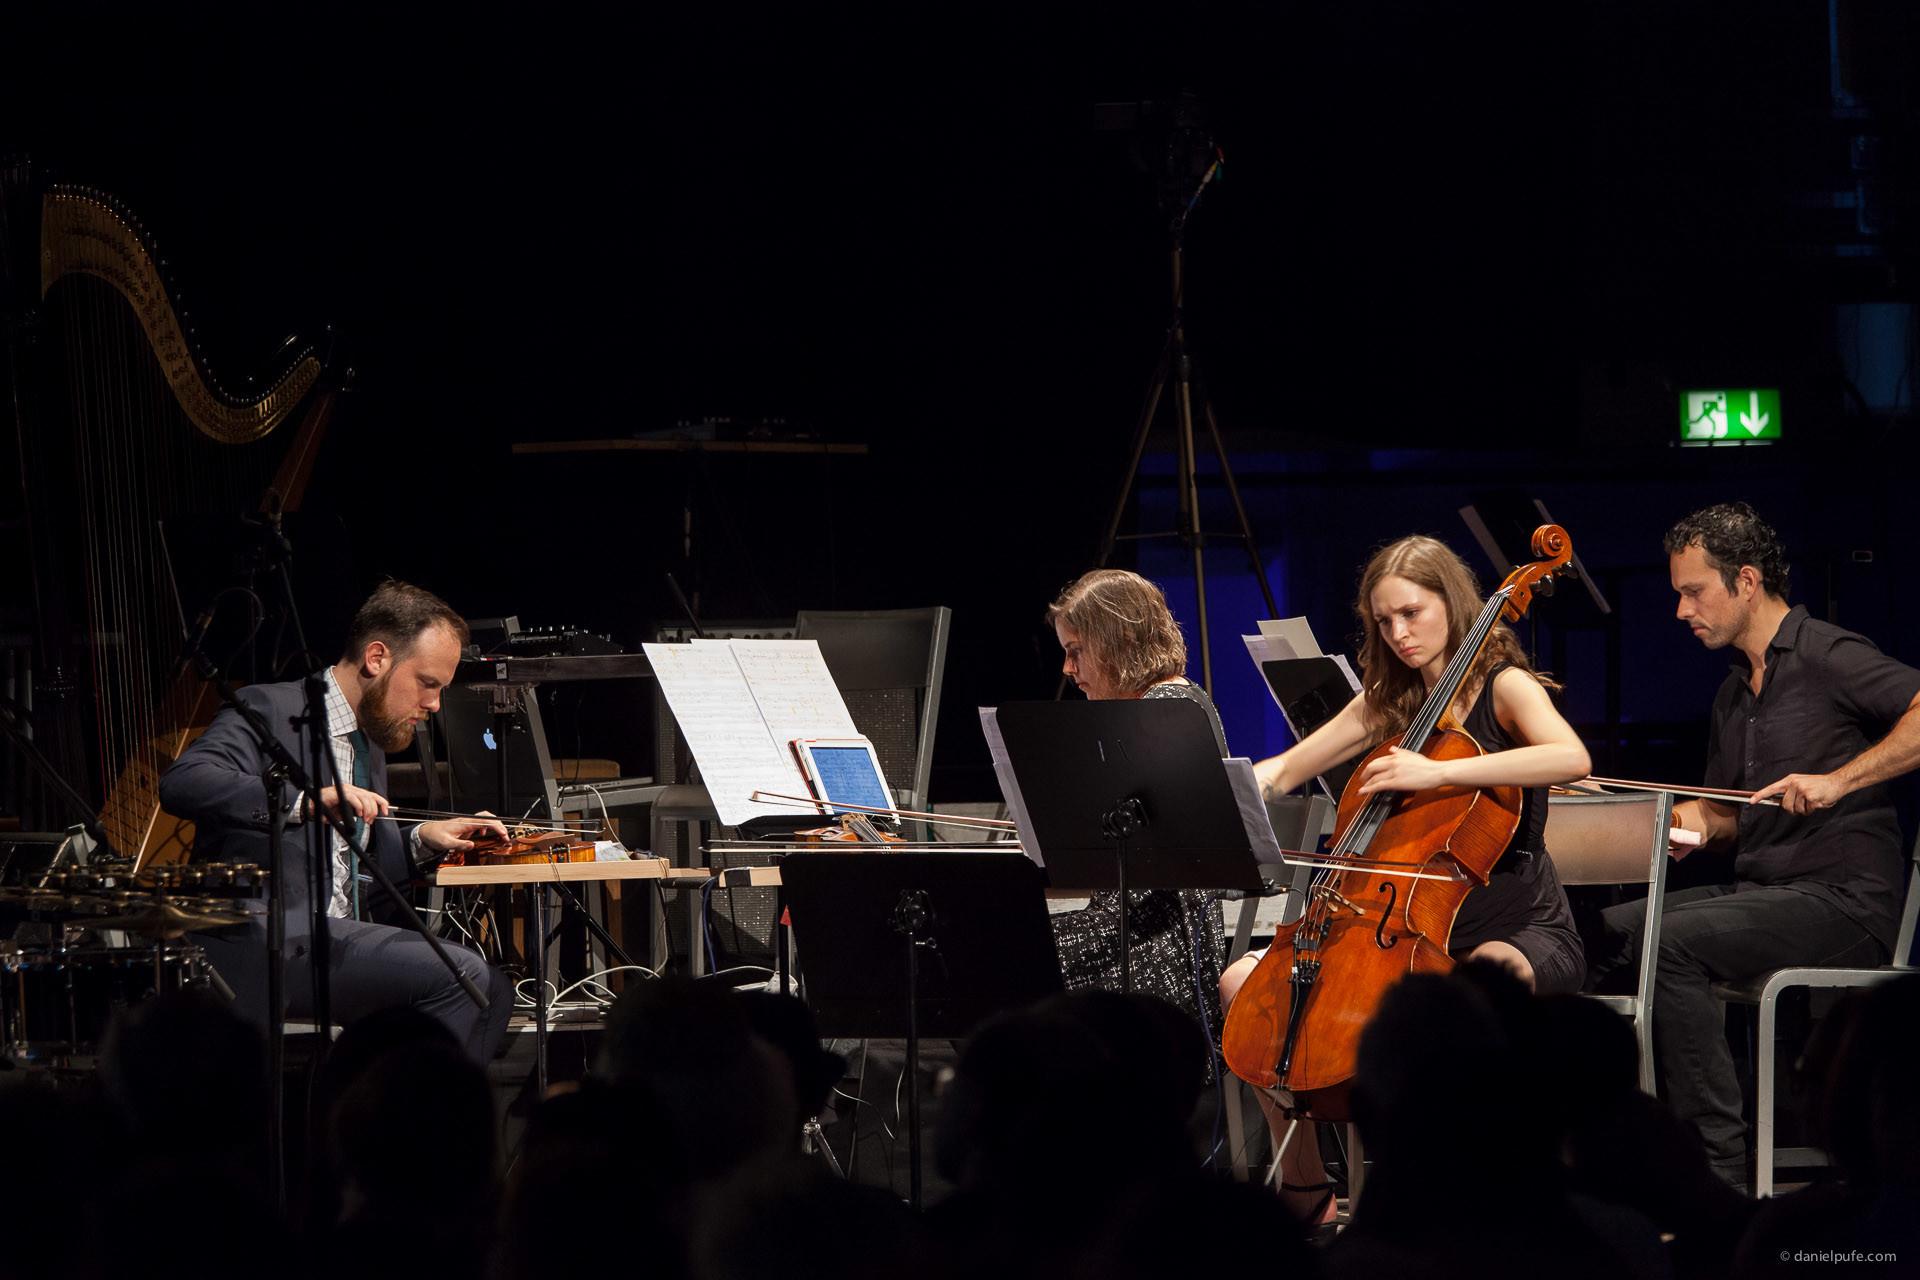 Concert: Adapter - Centralstation